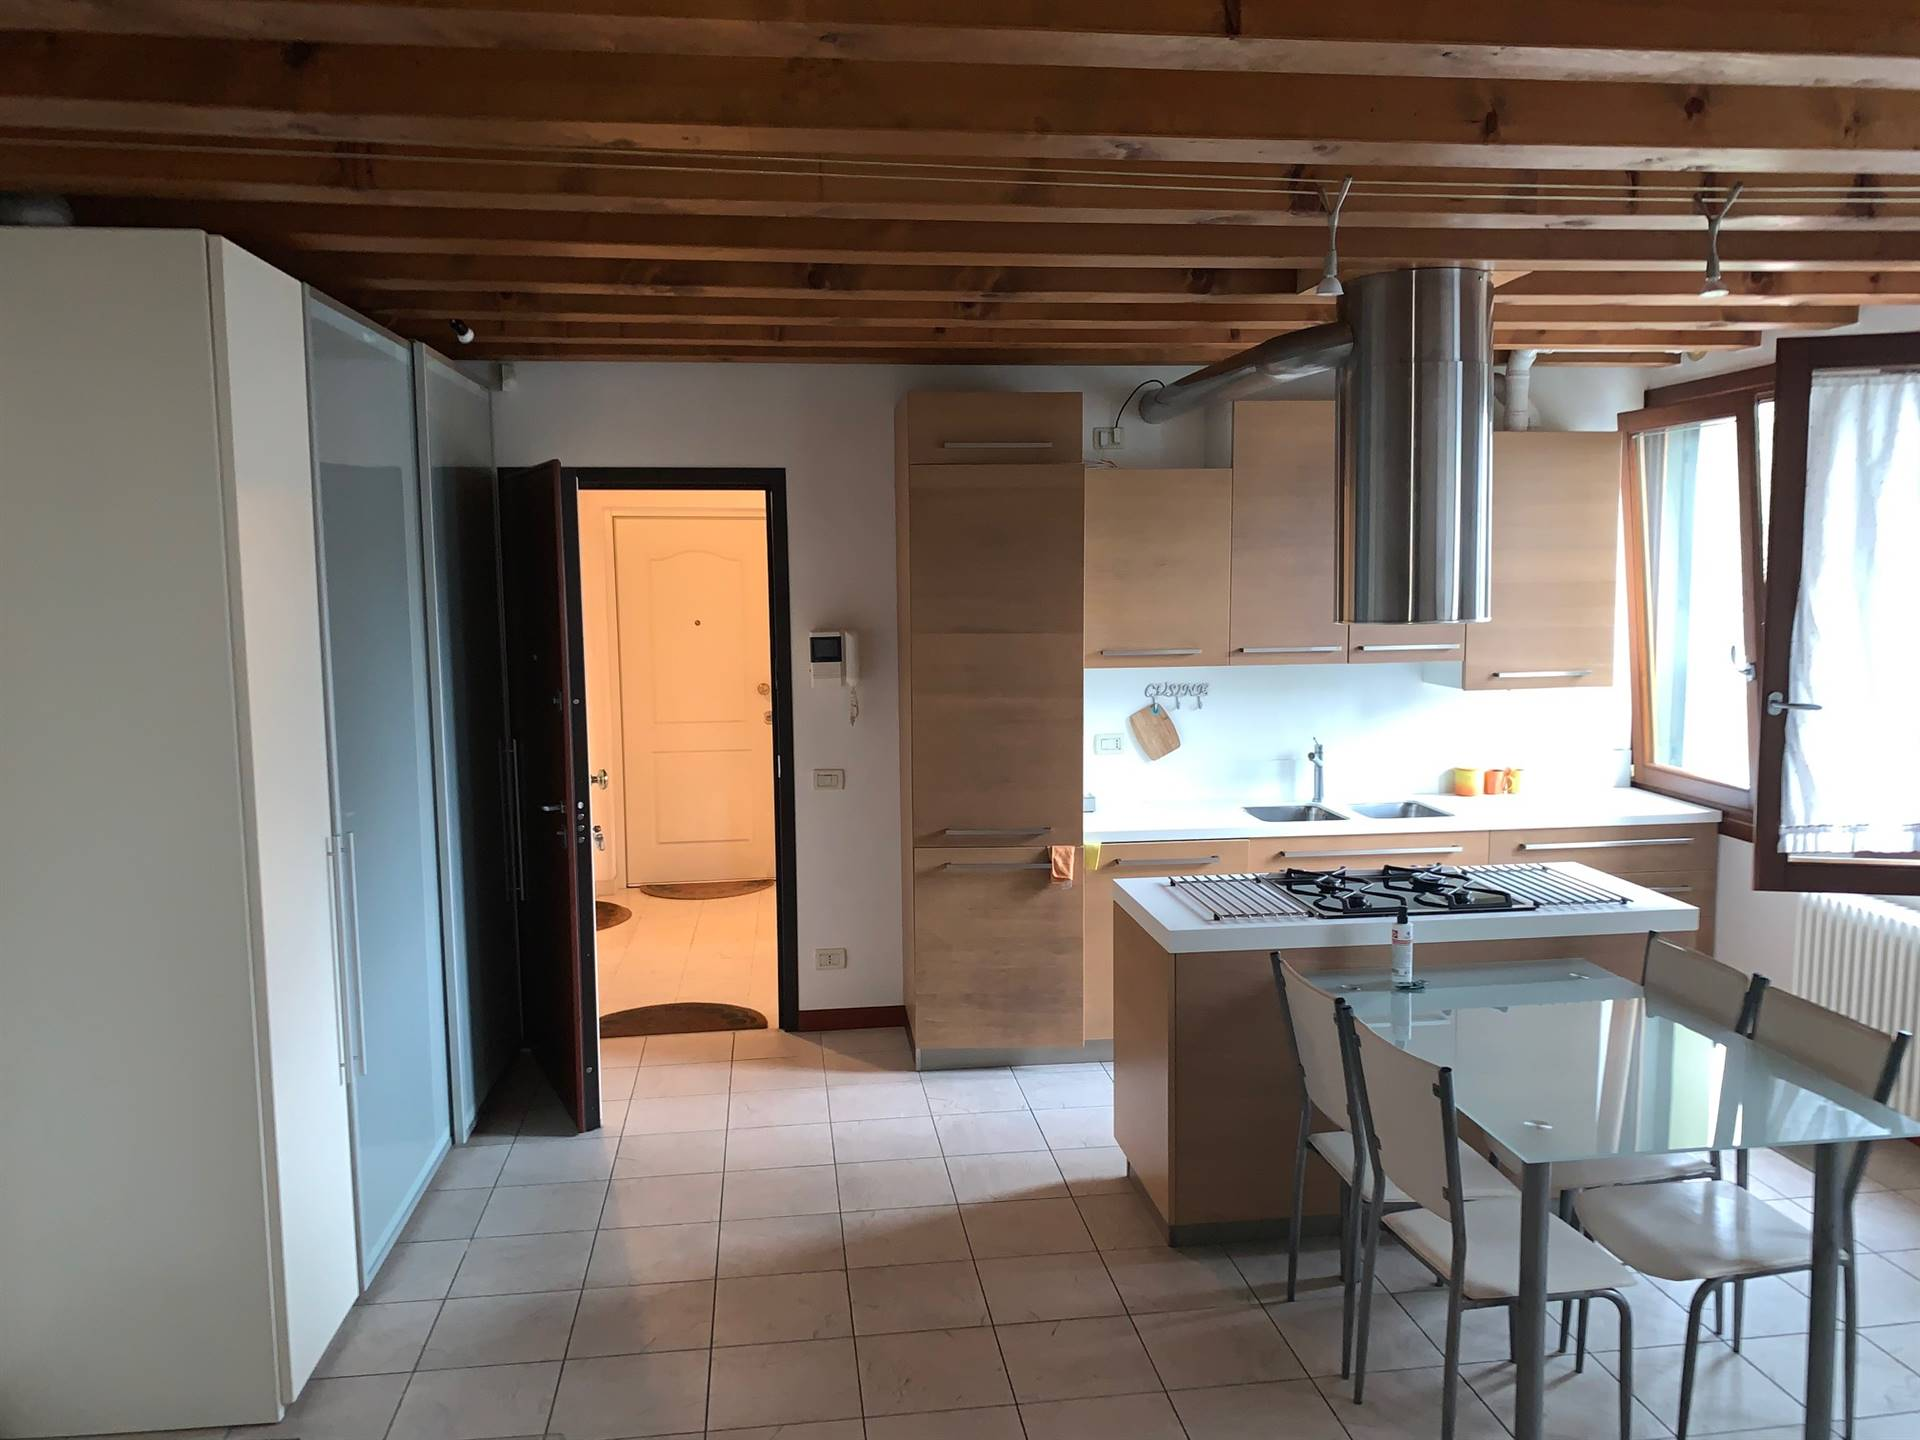 cucina abitabile con travi a vista Mestre centro